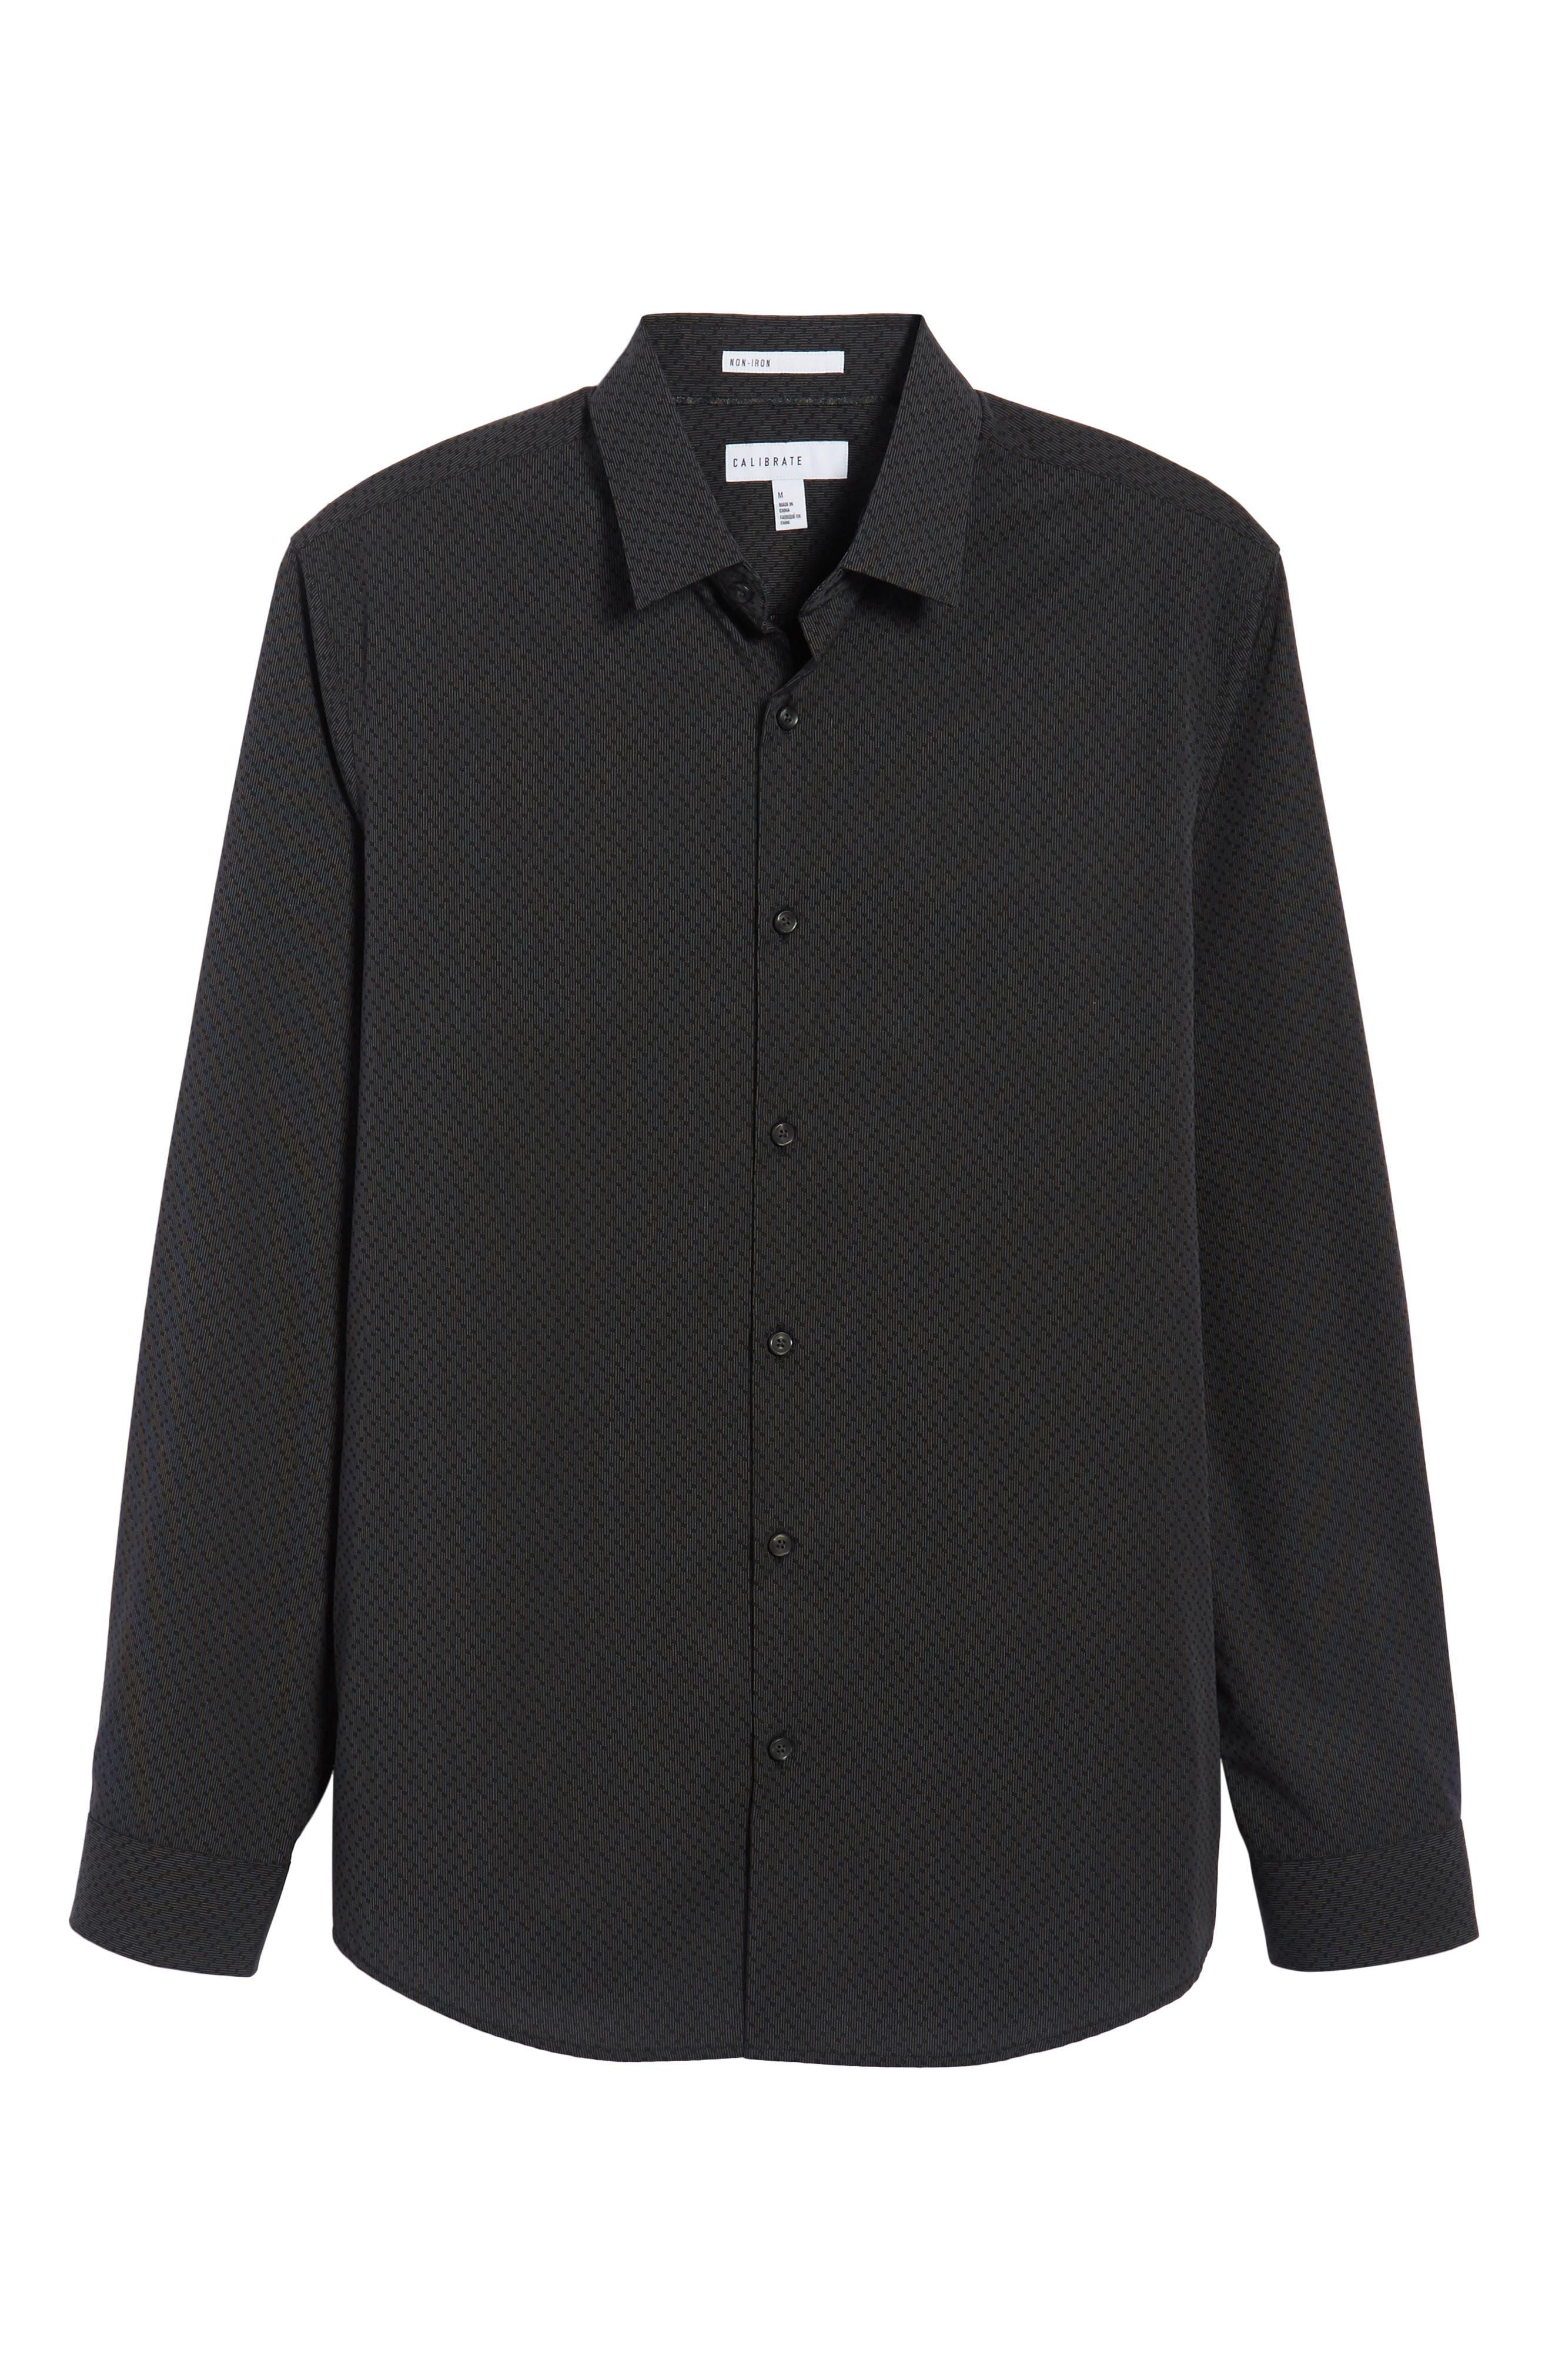 Trim Fit Print Sport Shirt,                             Alternate thumbnail 6, color,                             Black Caviar Dot Dobby